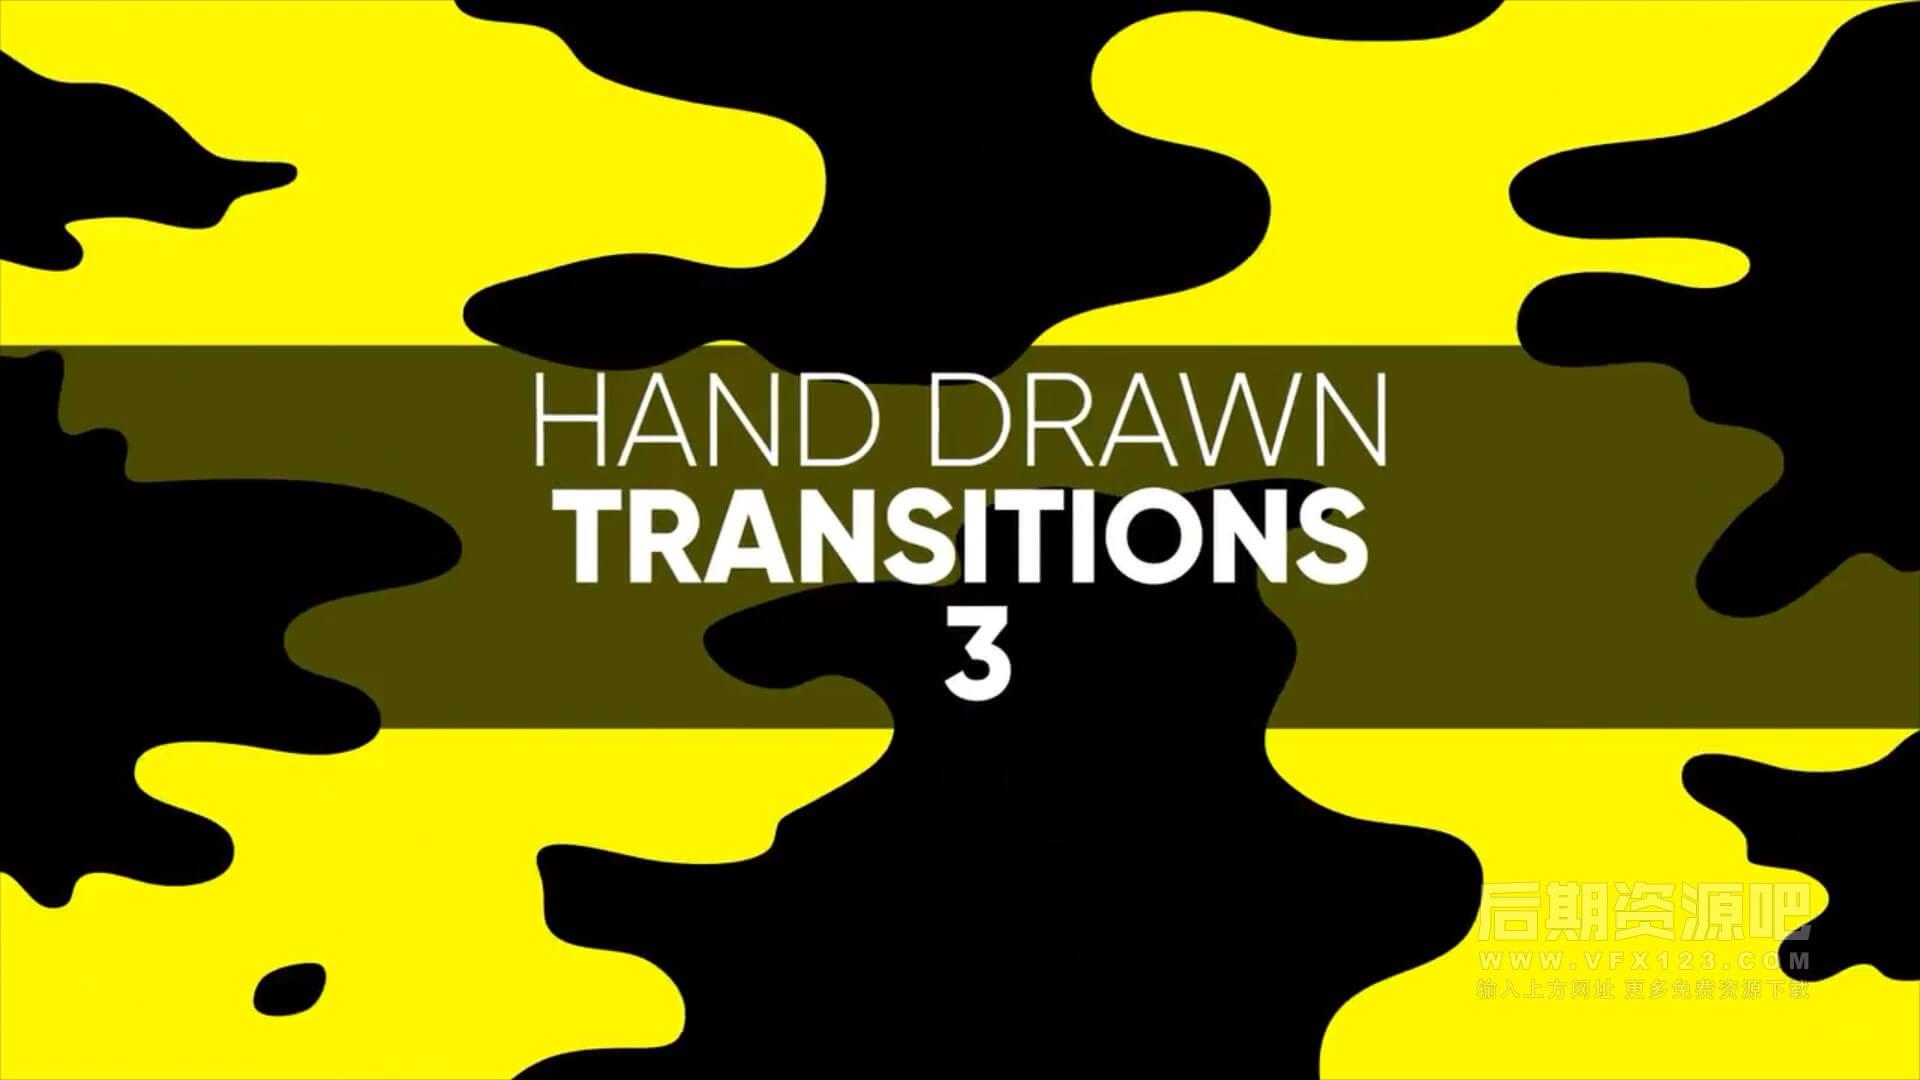 fcpx转场插件 16组卡通手绘可更改颜色转场预设系列3 Hand Drawn Transitions